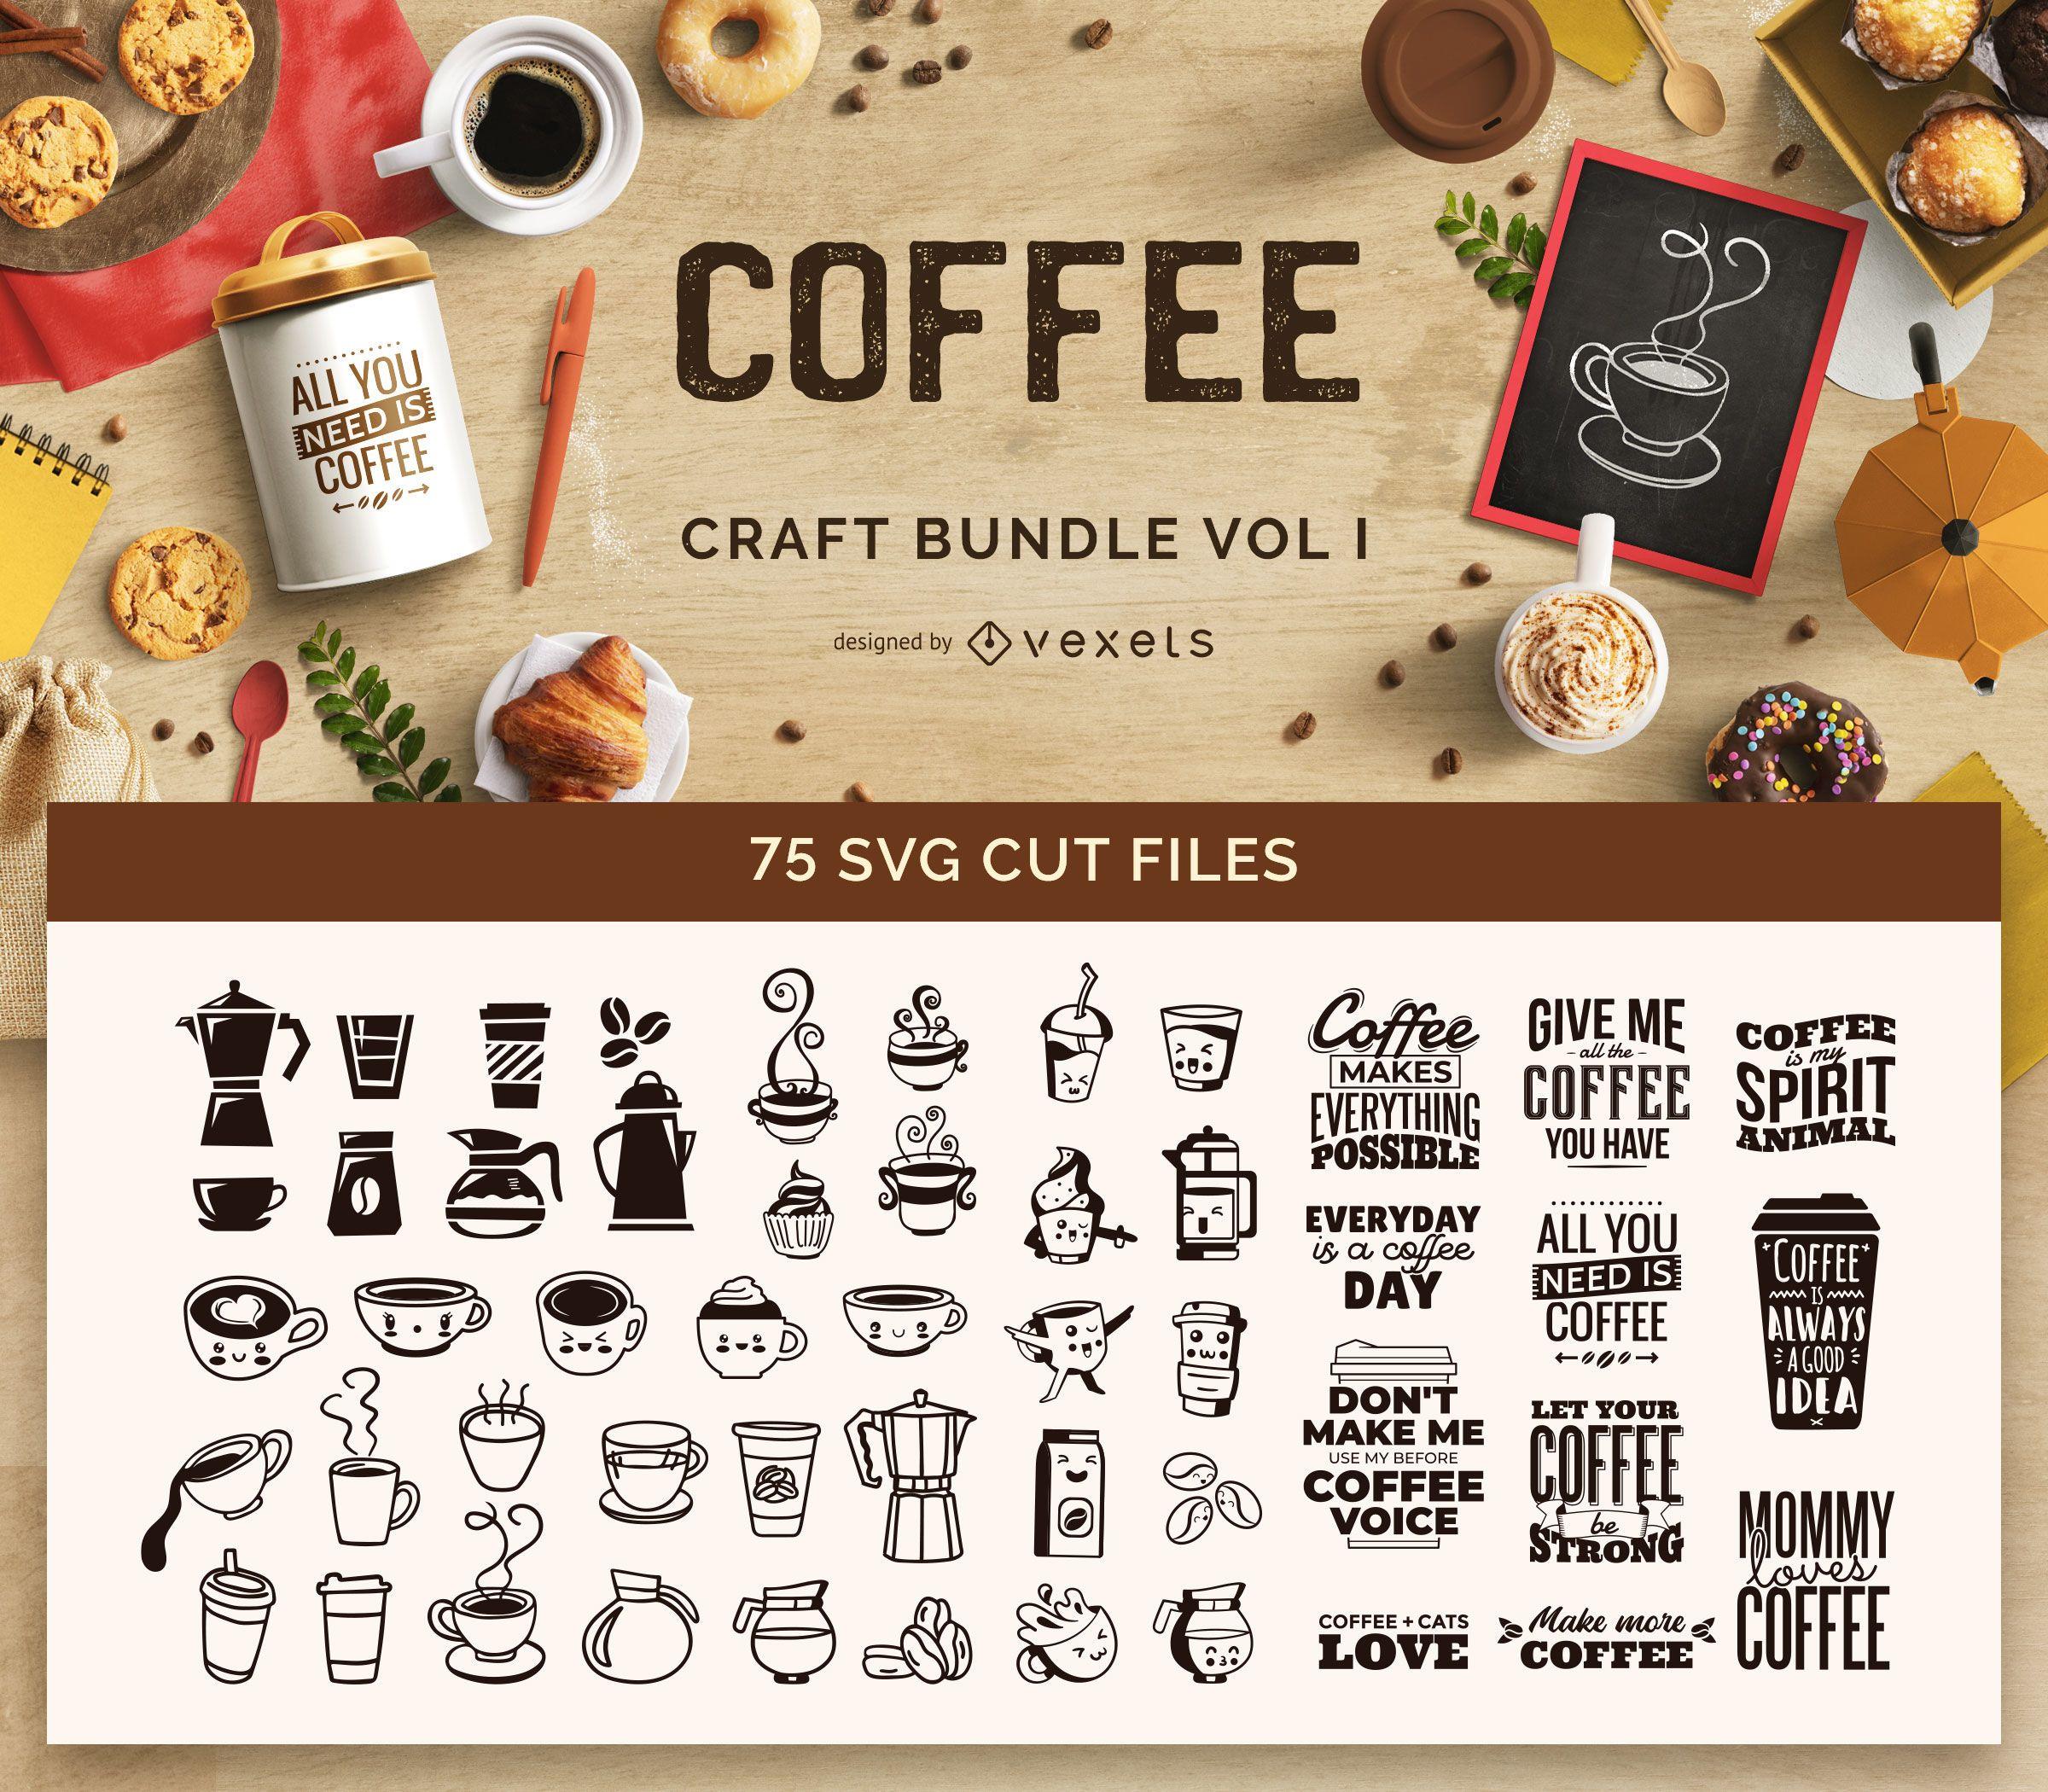 Coffee Craft Bundle Vol I